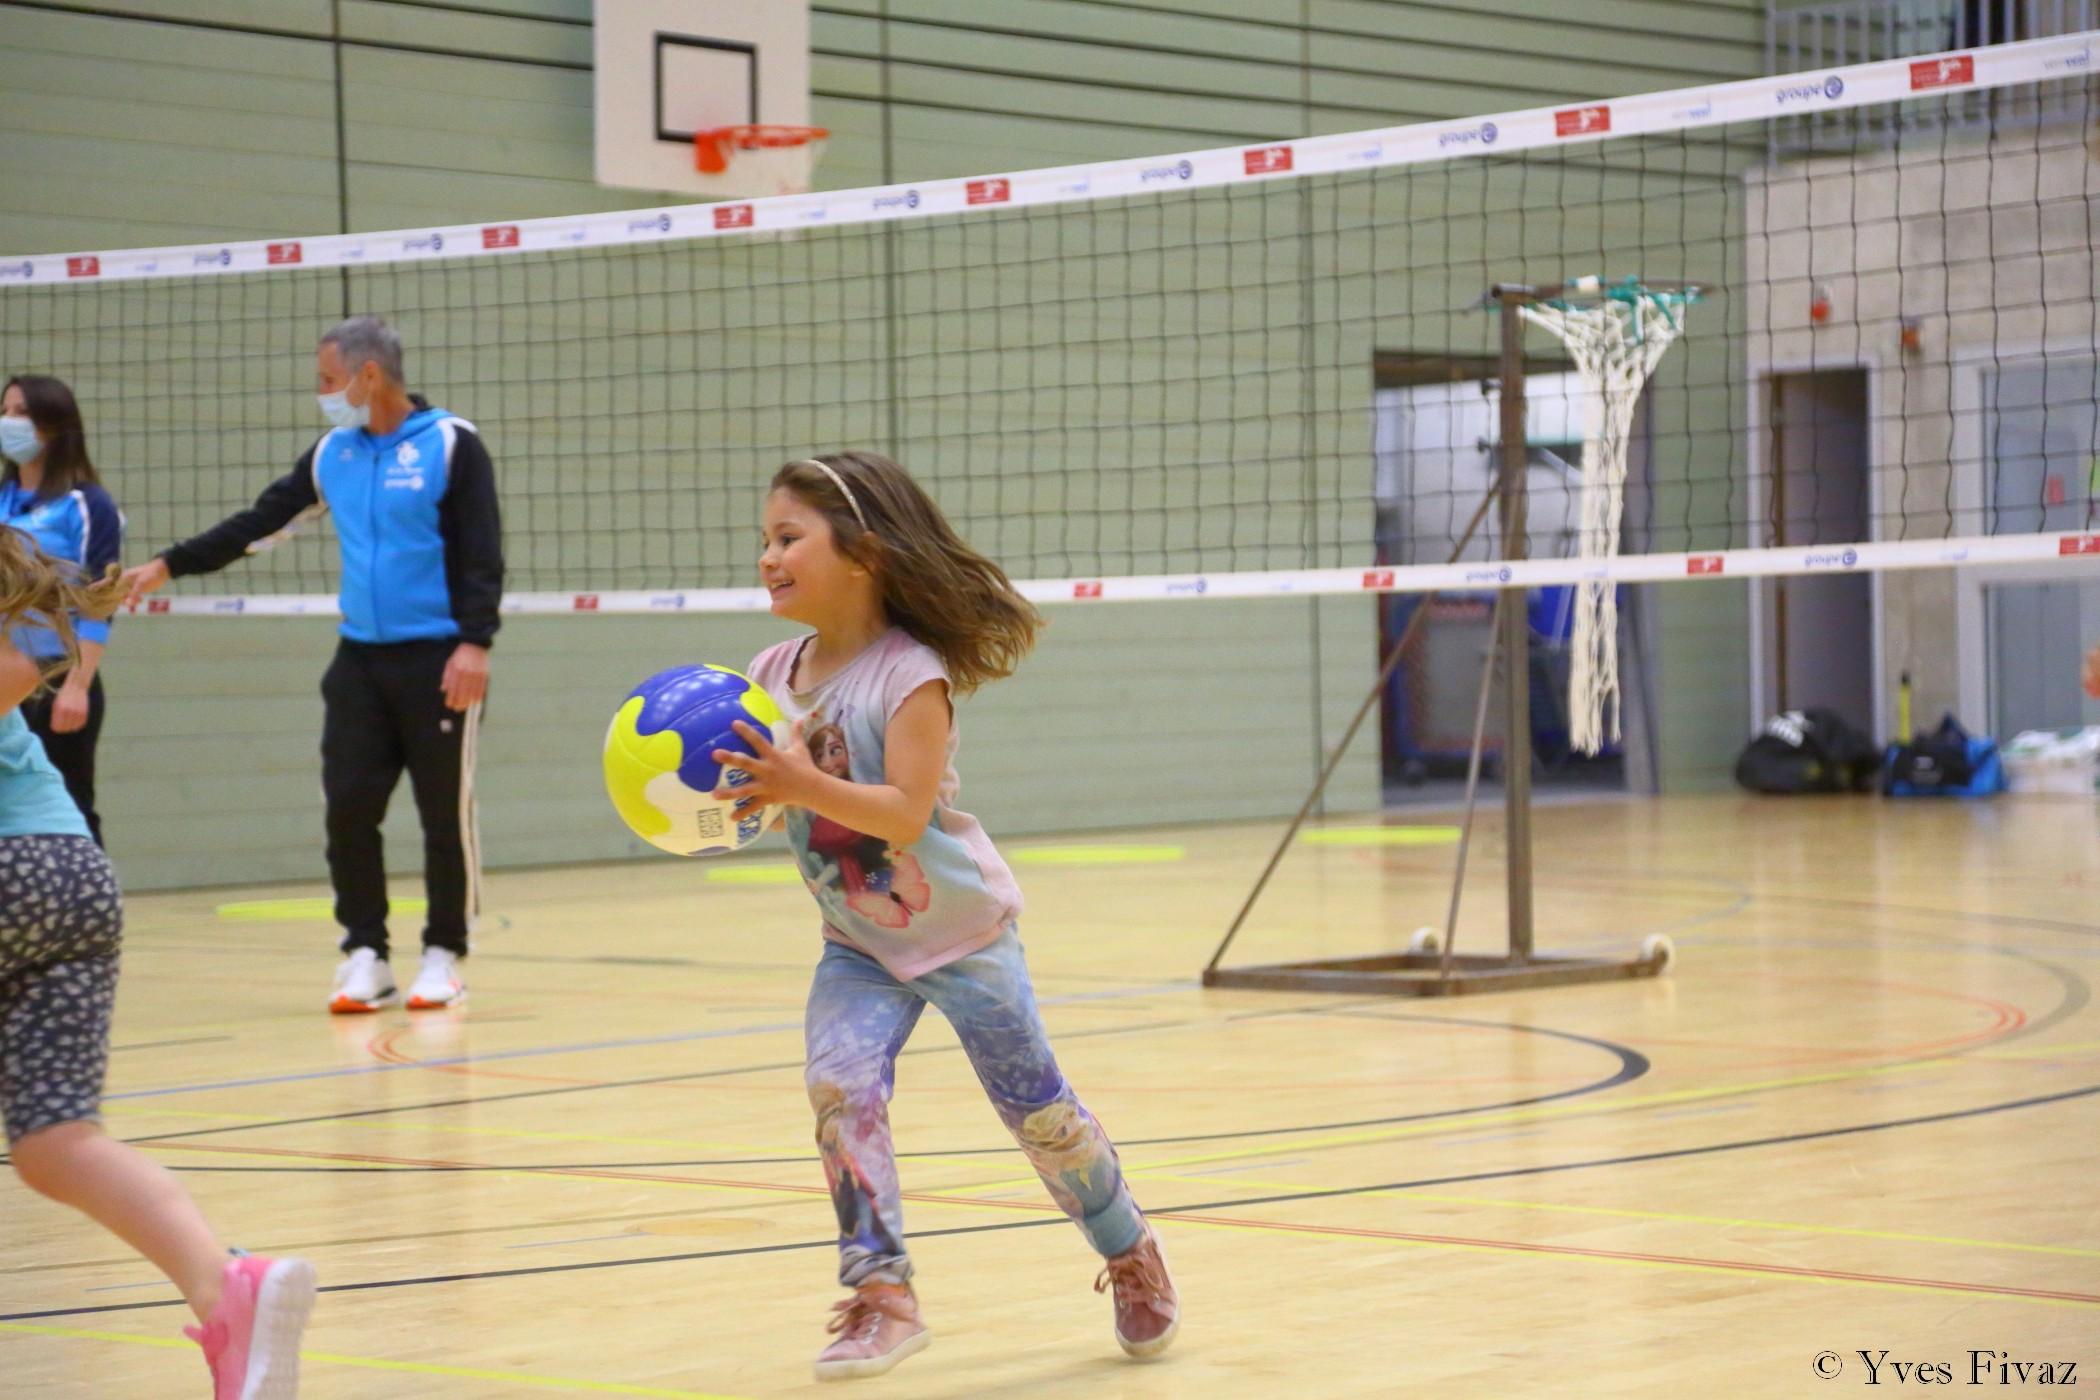 20210430_FYN_005_Kids academy Volley